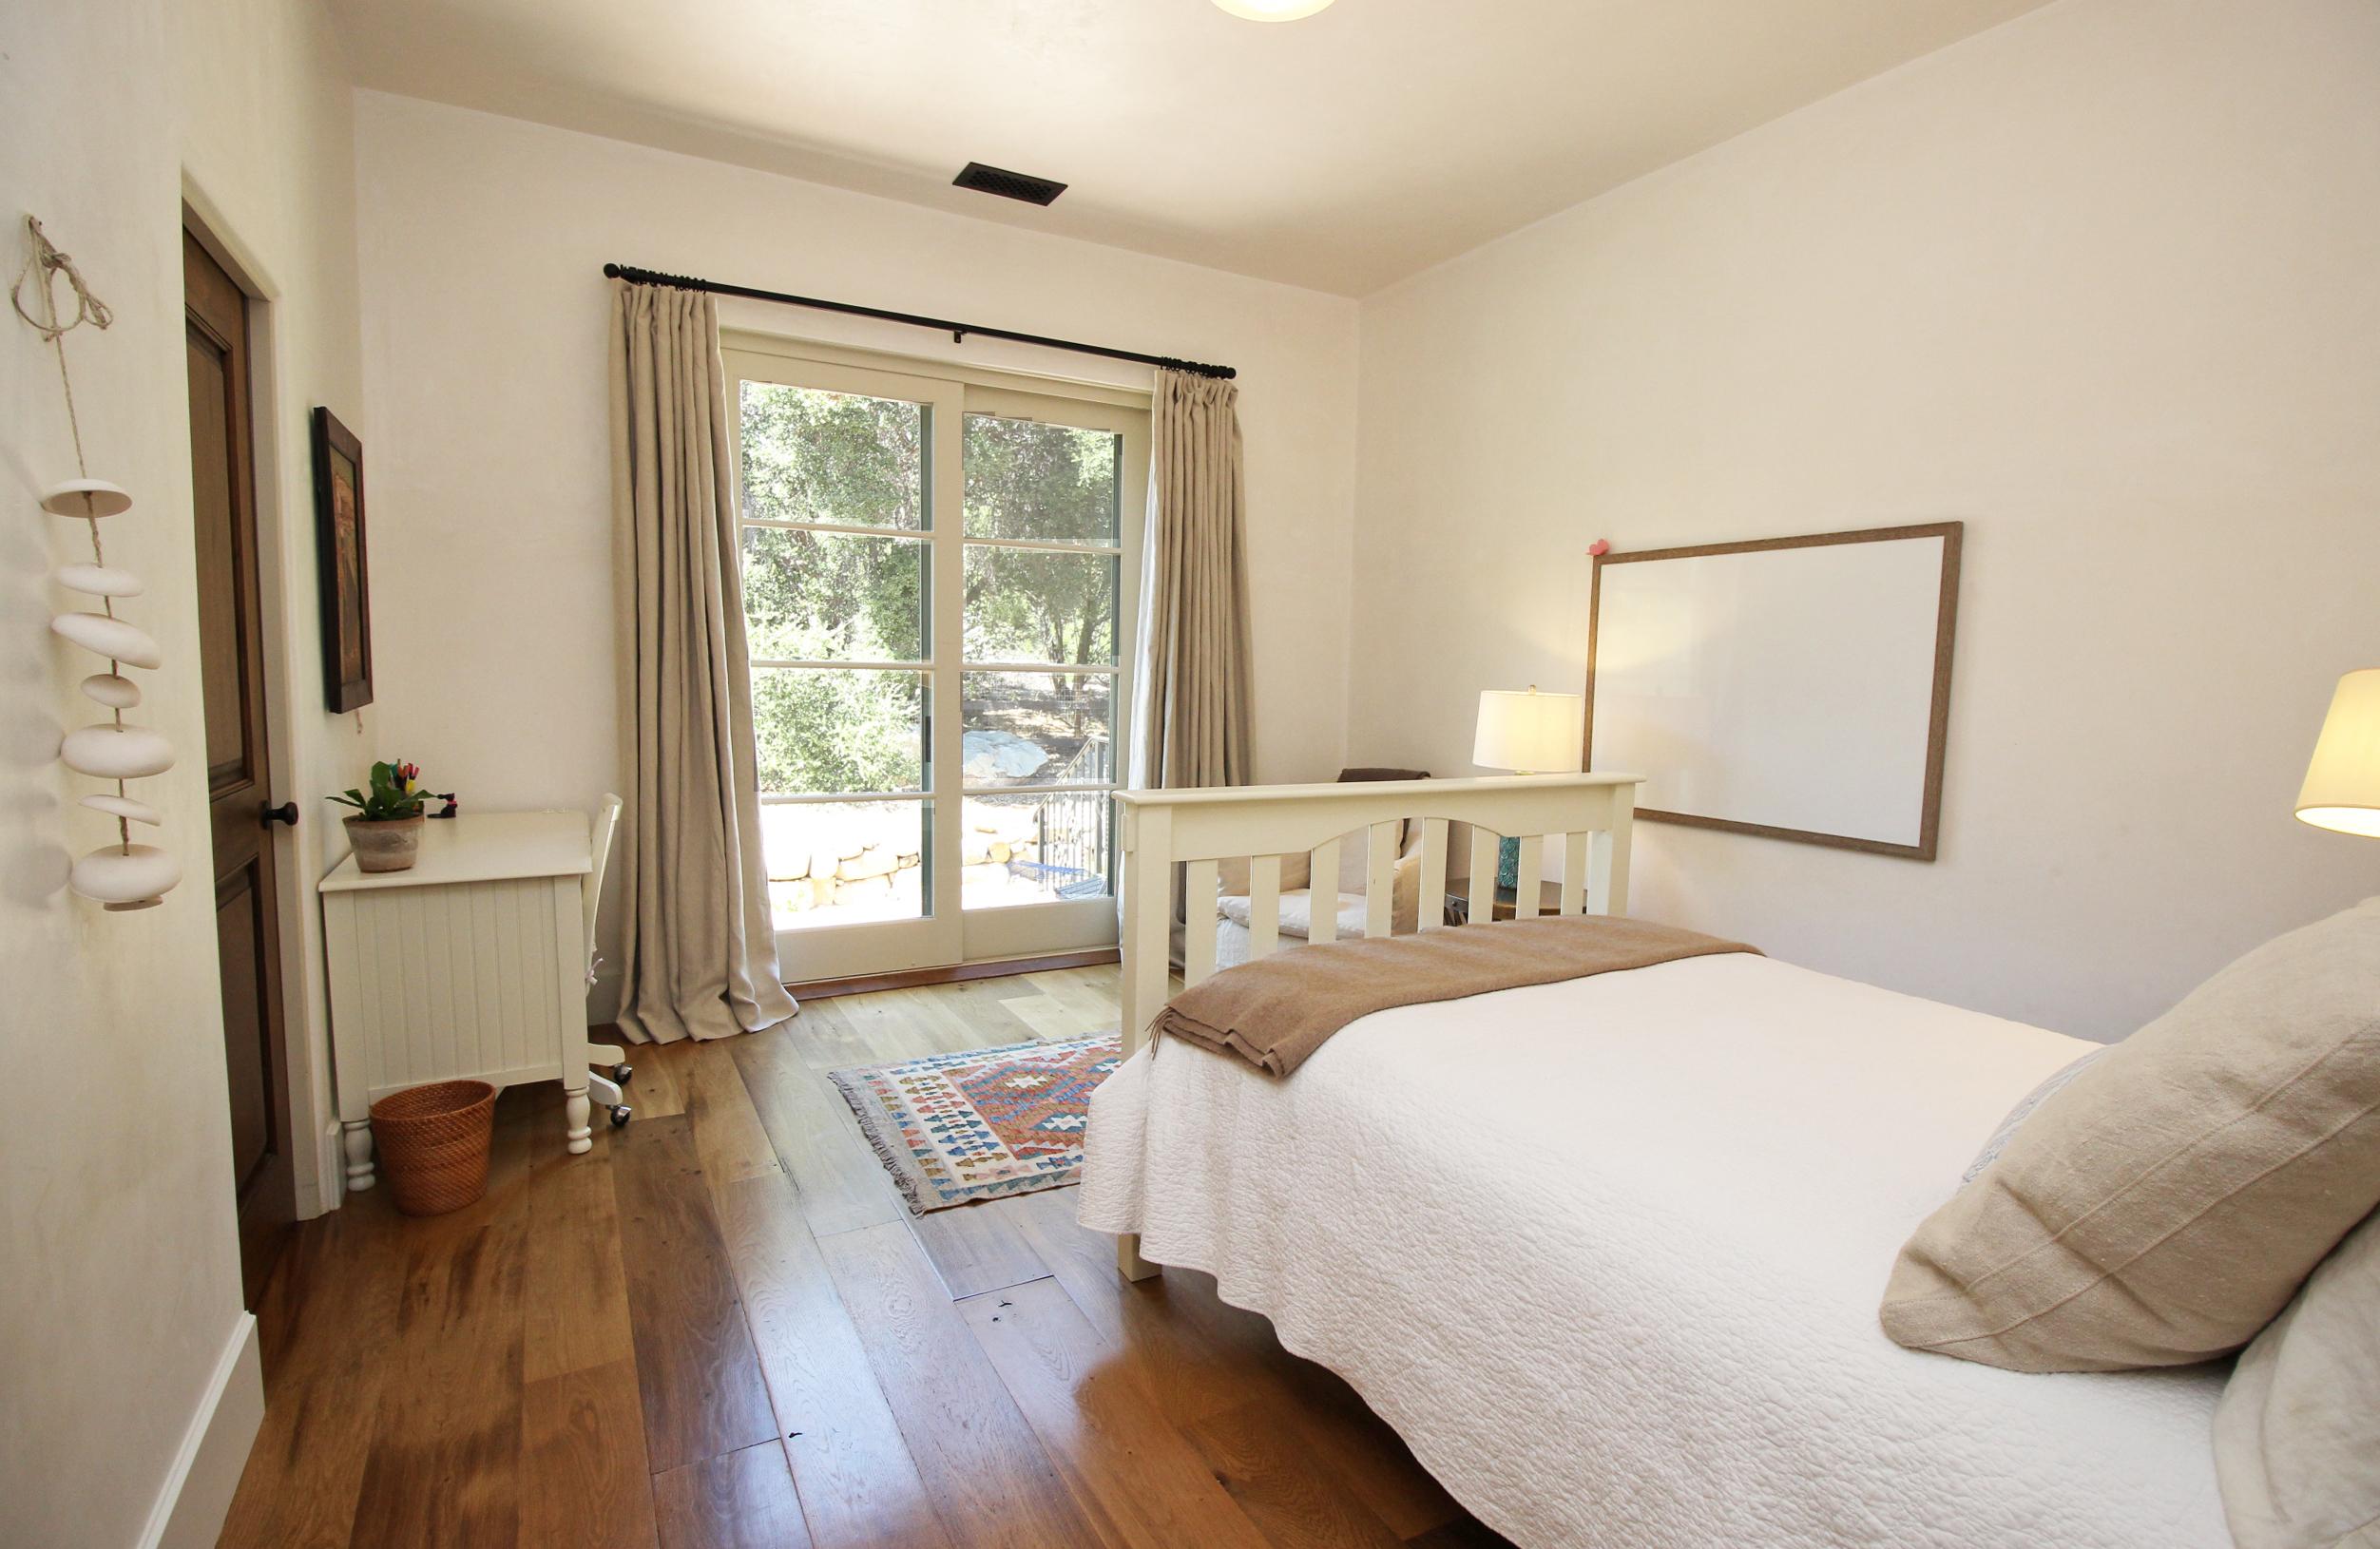 Bedroom drapery